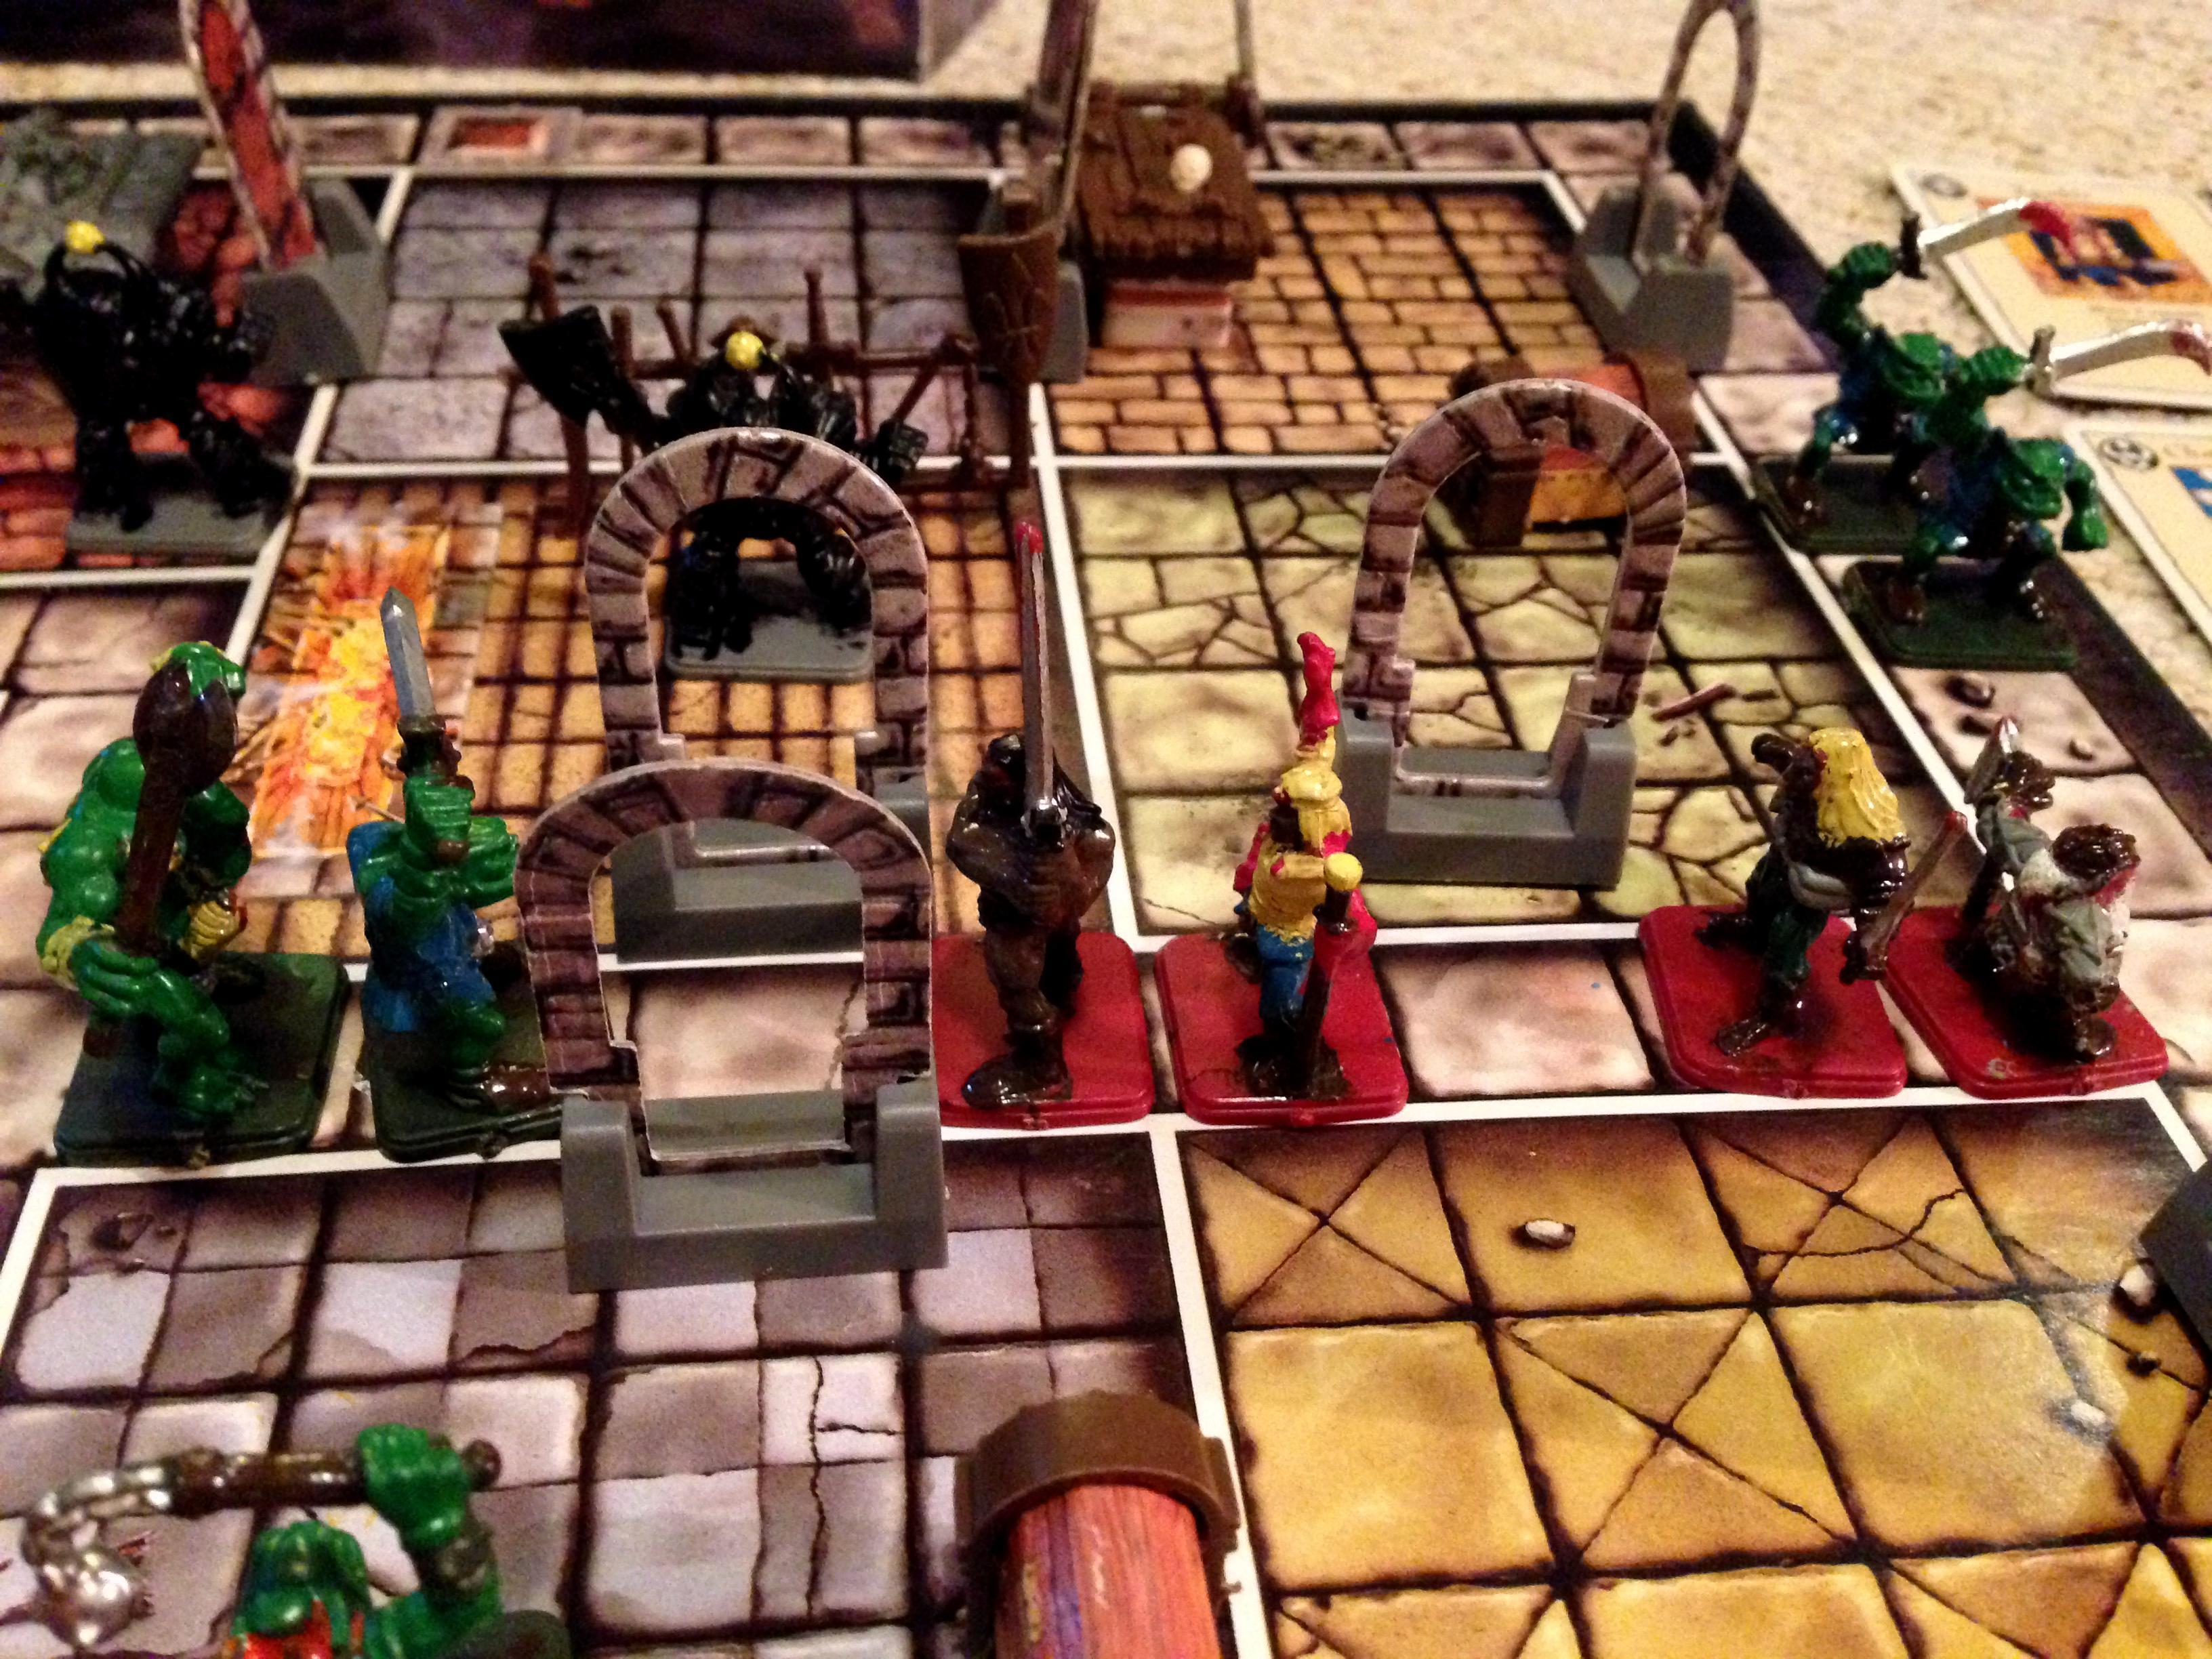 Barbarian, Chaos, Dwarves, Elves, Game, Games Workshop, Gargoyle, Heroquest, Kellar, Keller, Mummy, Ogres, Quest, Skeletons, Tabletop, Warhammer Fantasy, Witch Lord, Wizard, Zombie